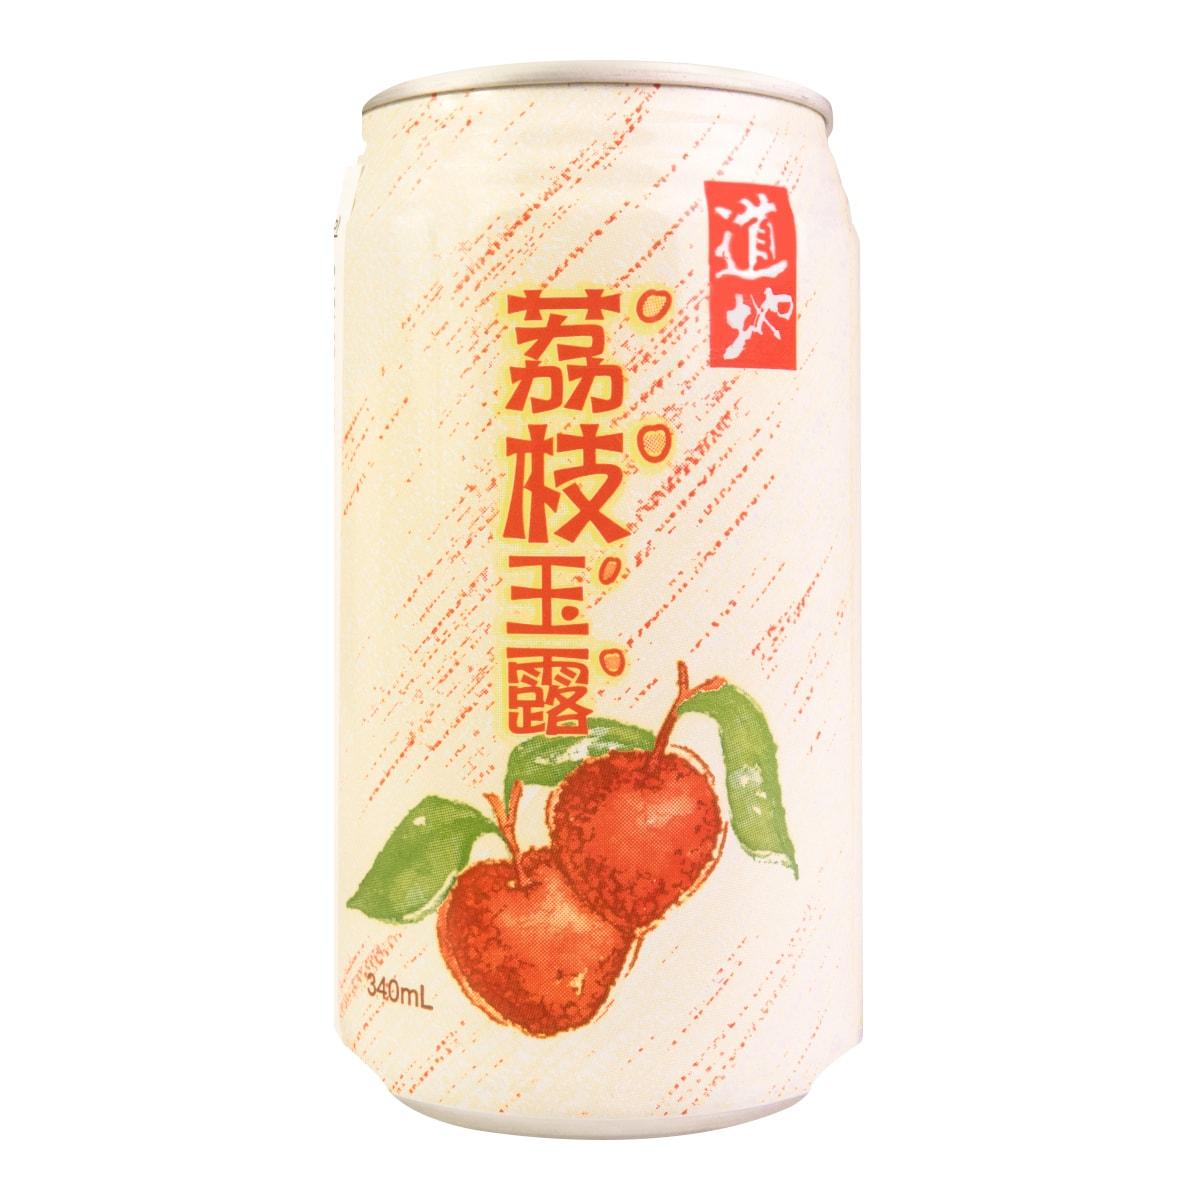 Tao Ti Taiwanese Lychee Juice Drink 340ml